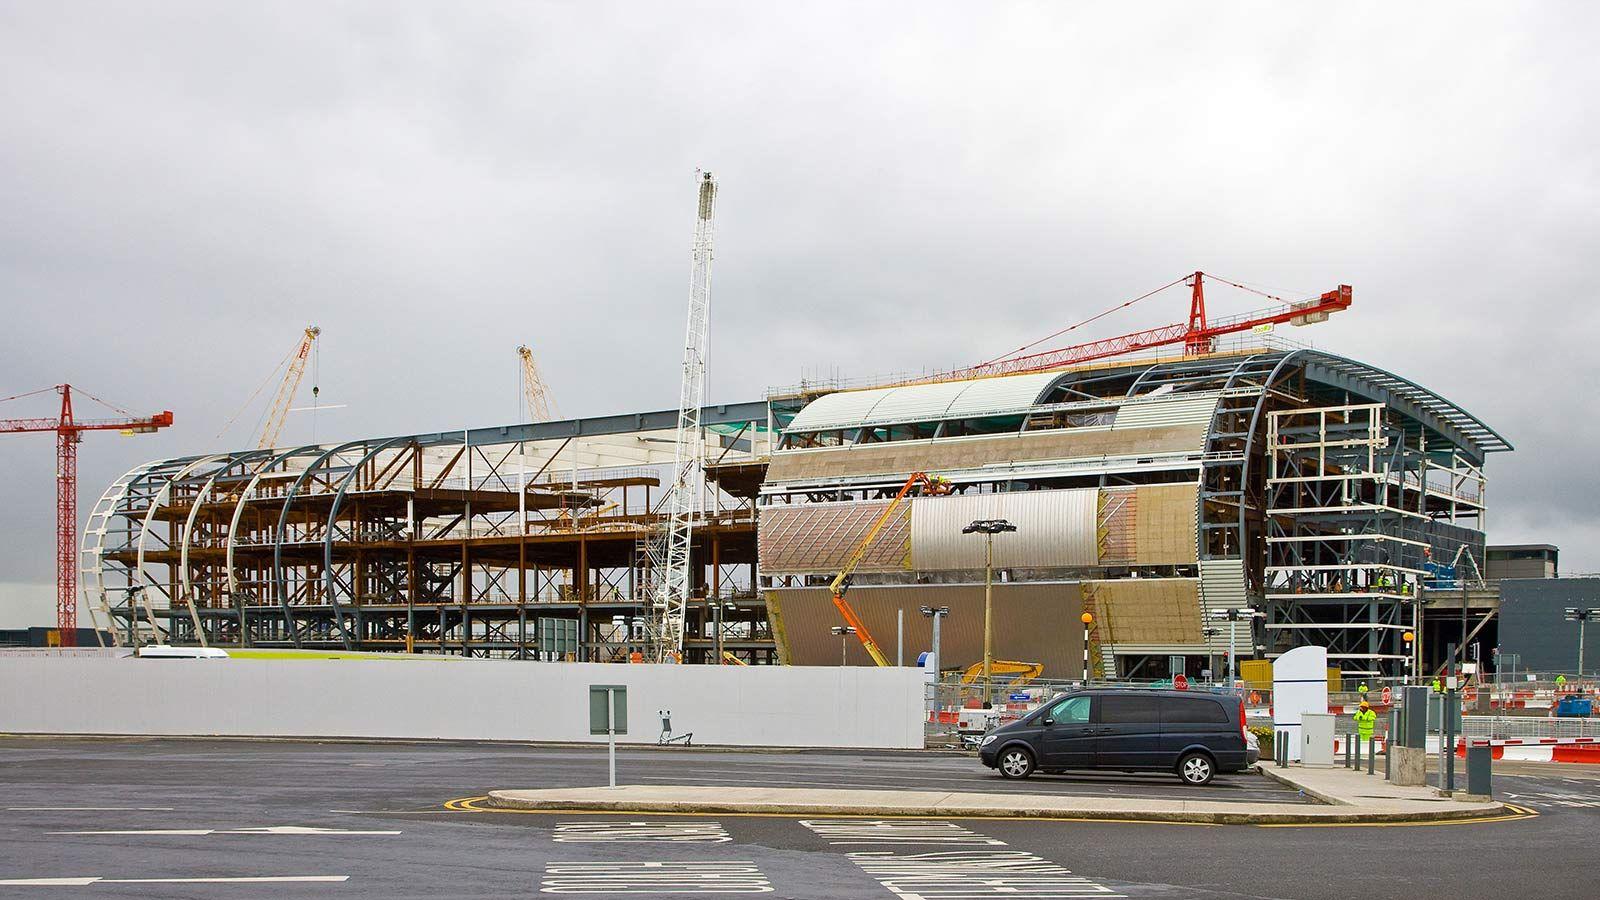 Dublin Airport Building Construction - Mace Group